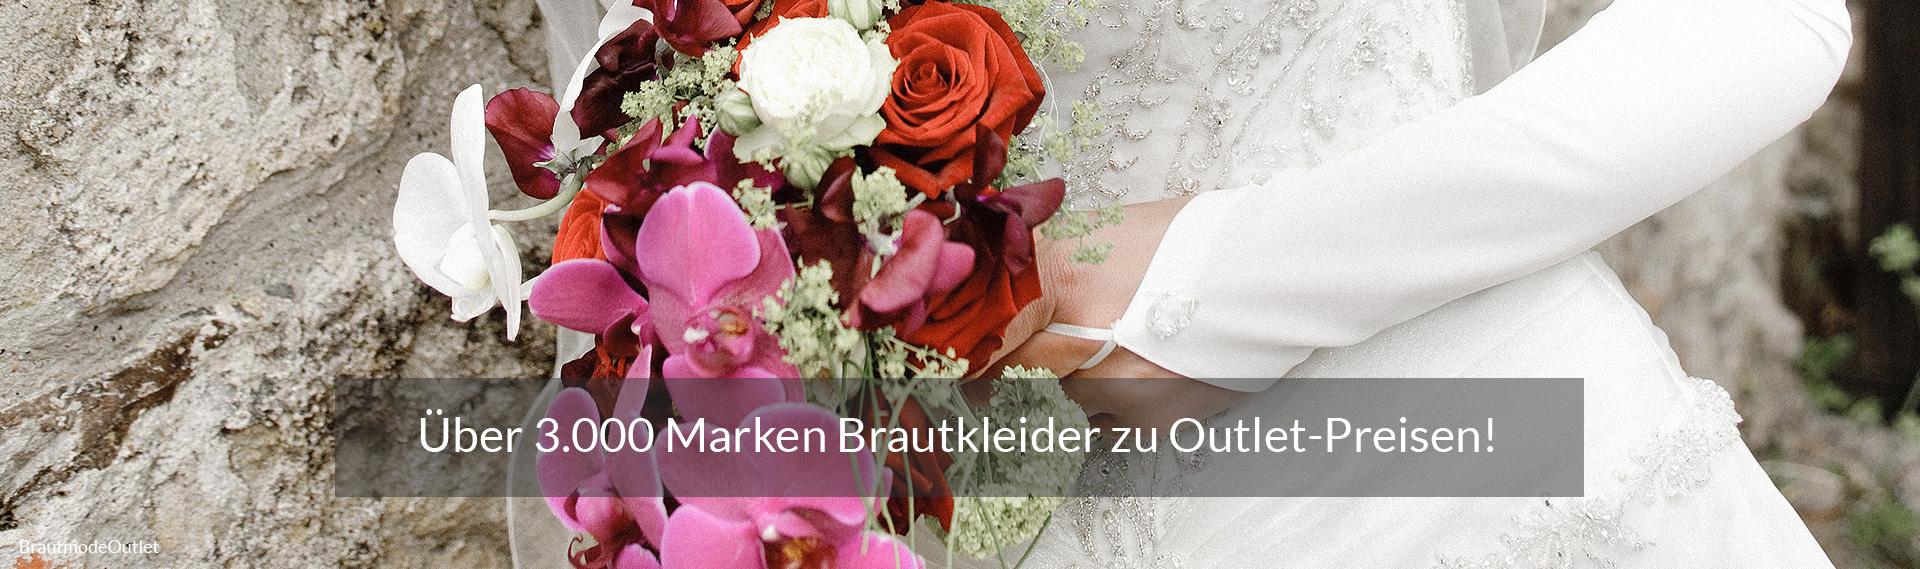 BrautmodeOutlet Bautzen Outlet Brautmode Brautkleid Qualität